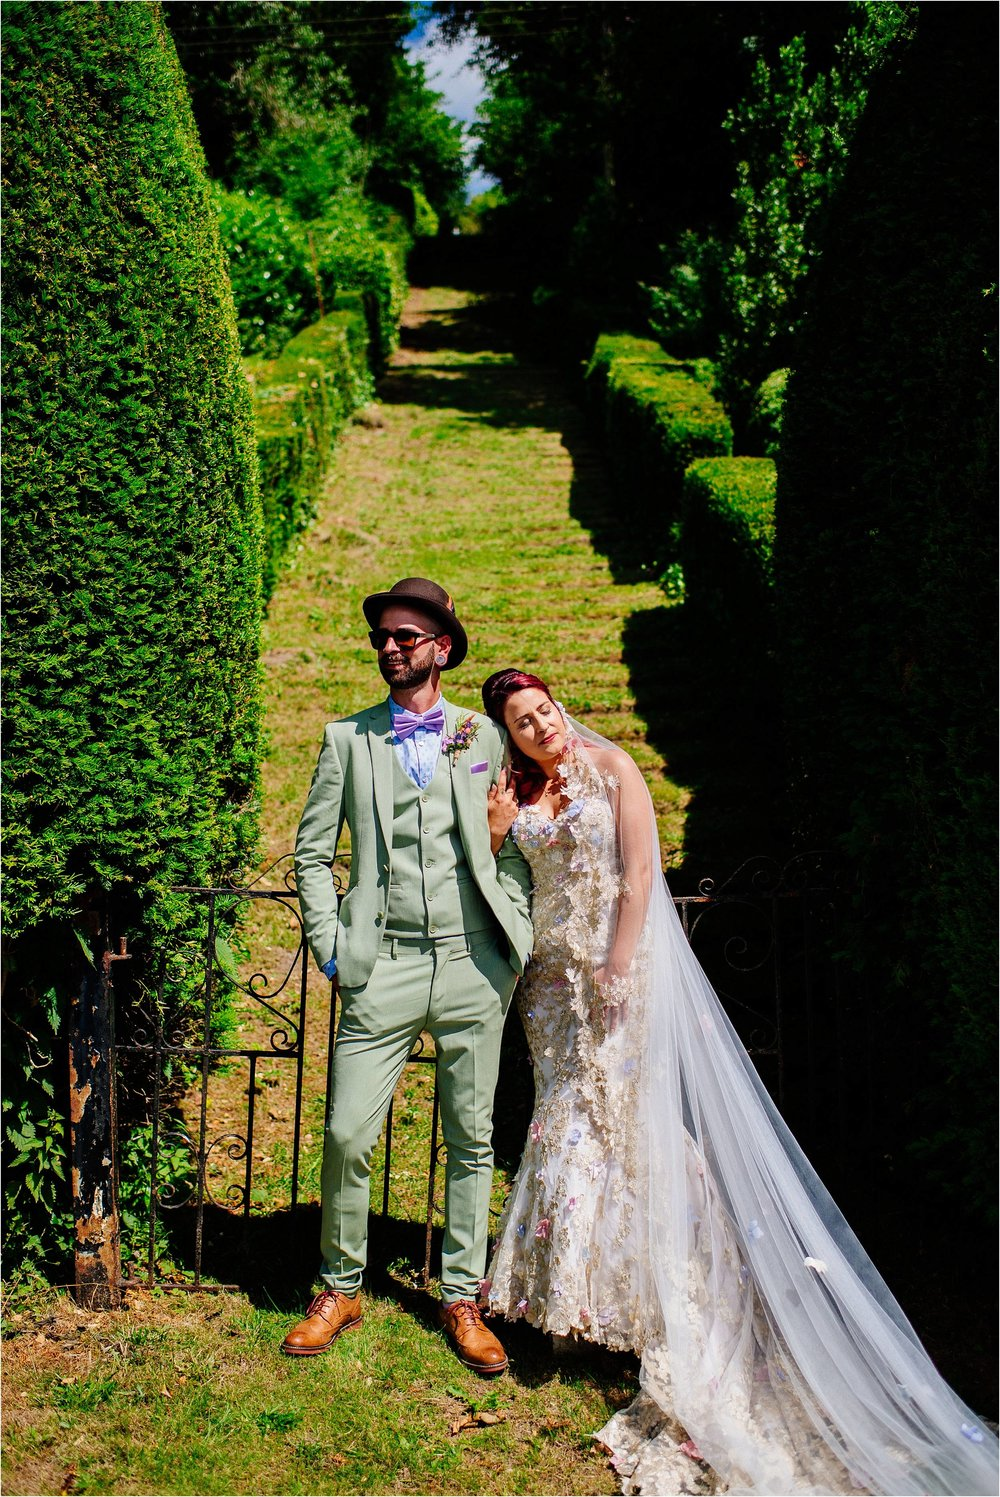 Milton Abbey Dorset Wedding Photographer_0092.jpg